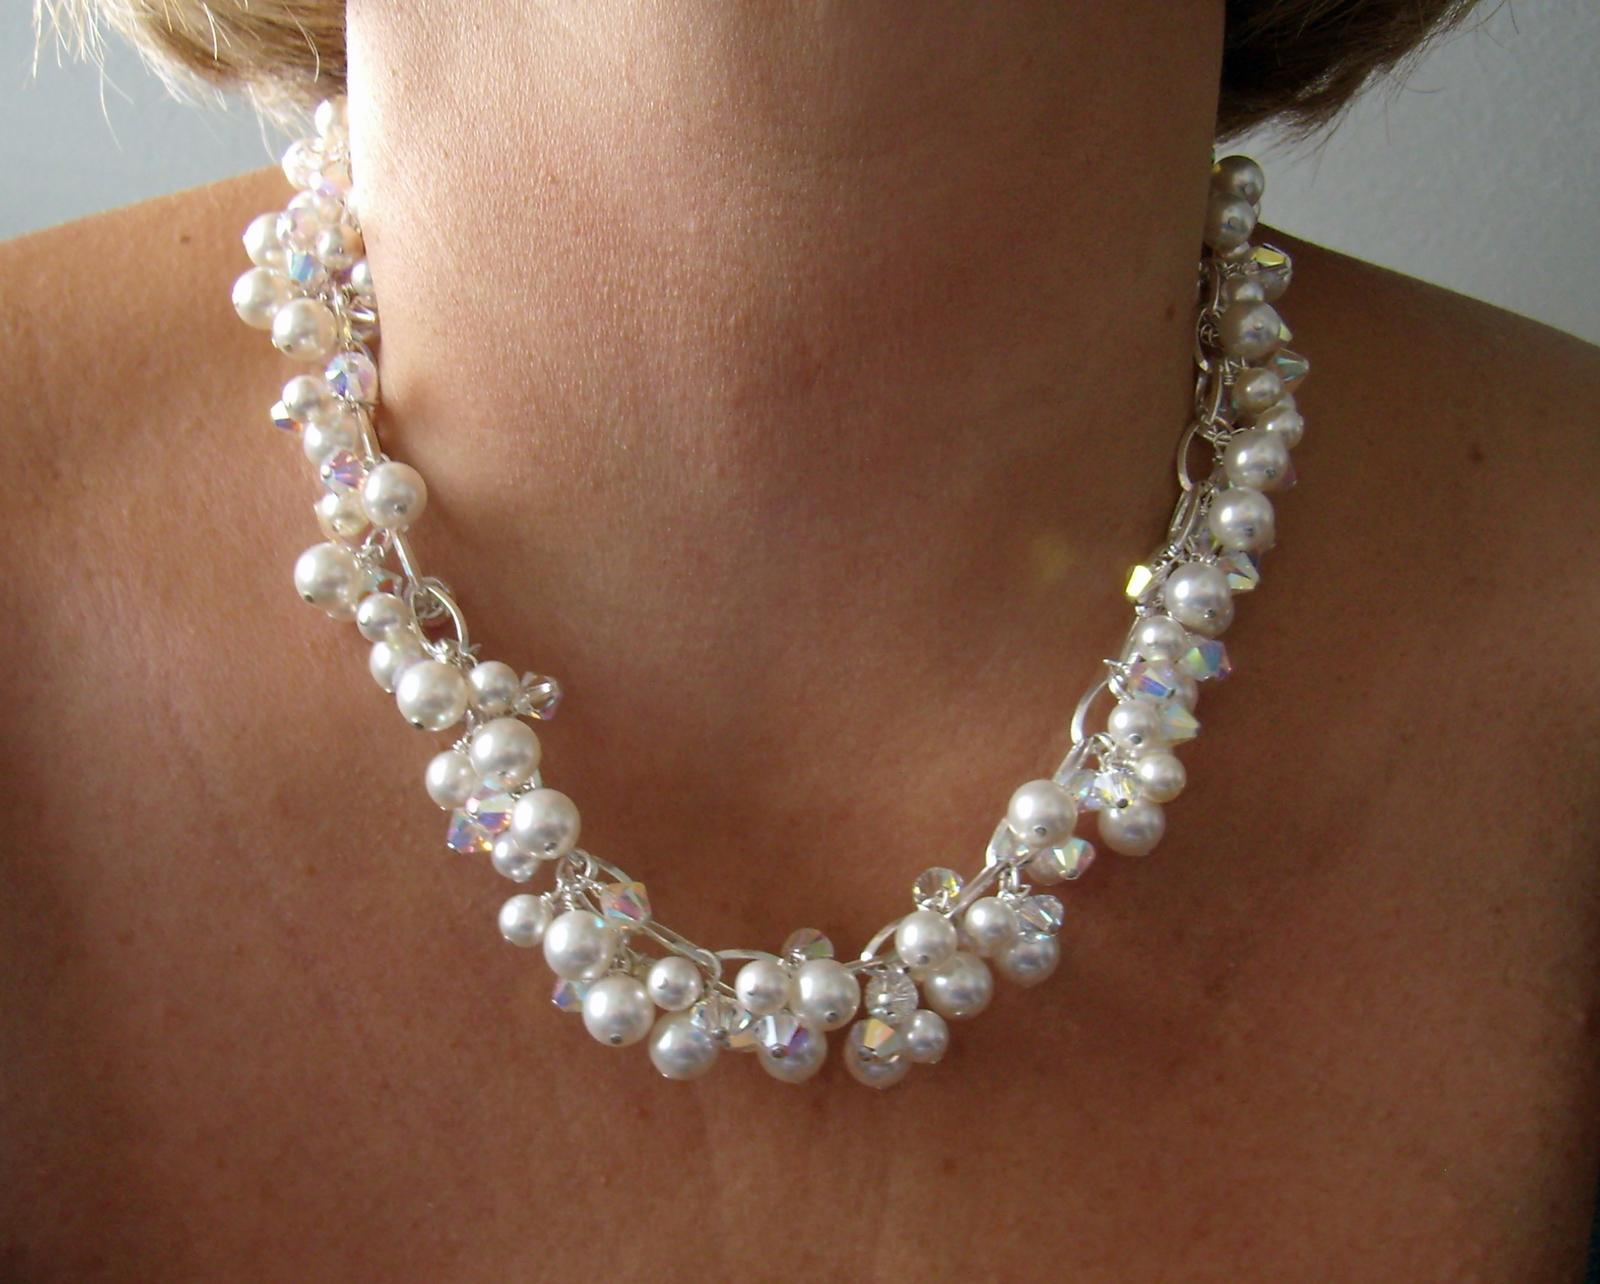 Swarovski   ® Pearl & Bead Choker Necklace - Gianna Seca